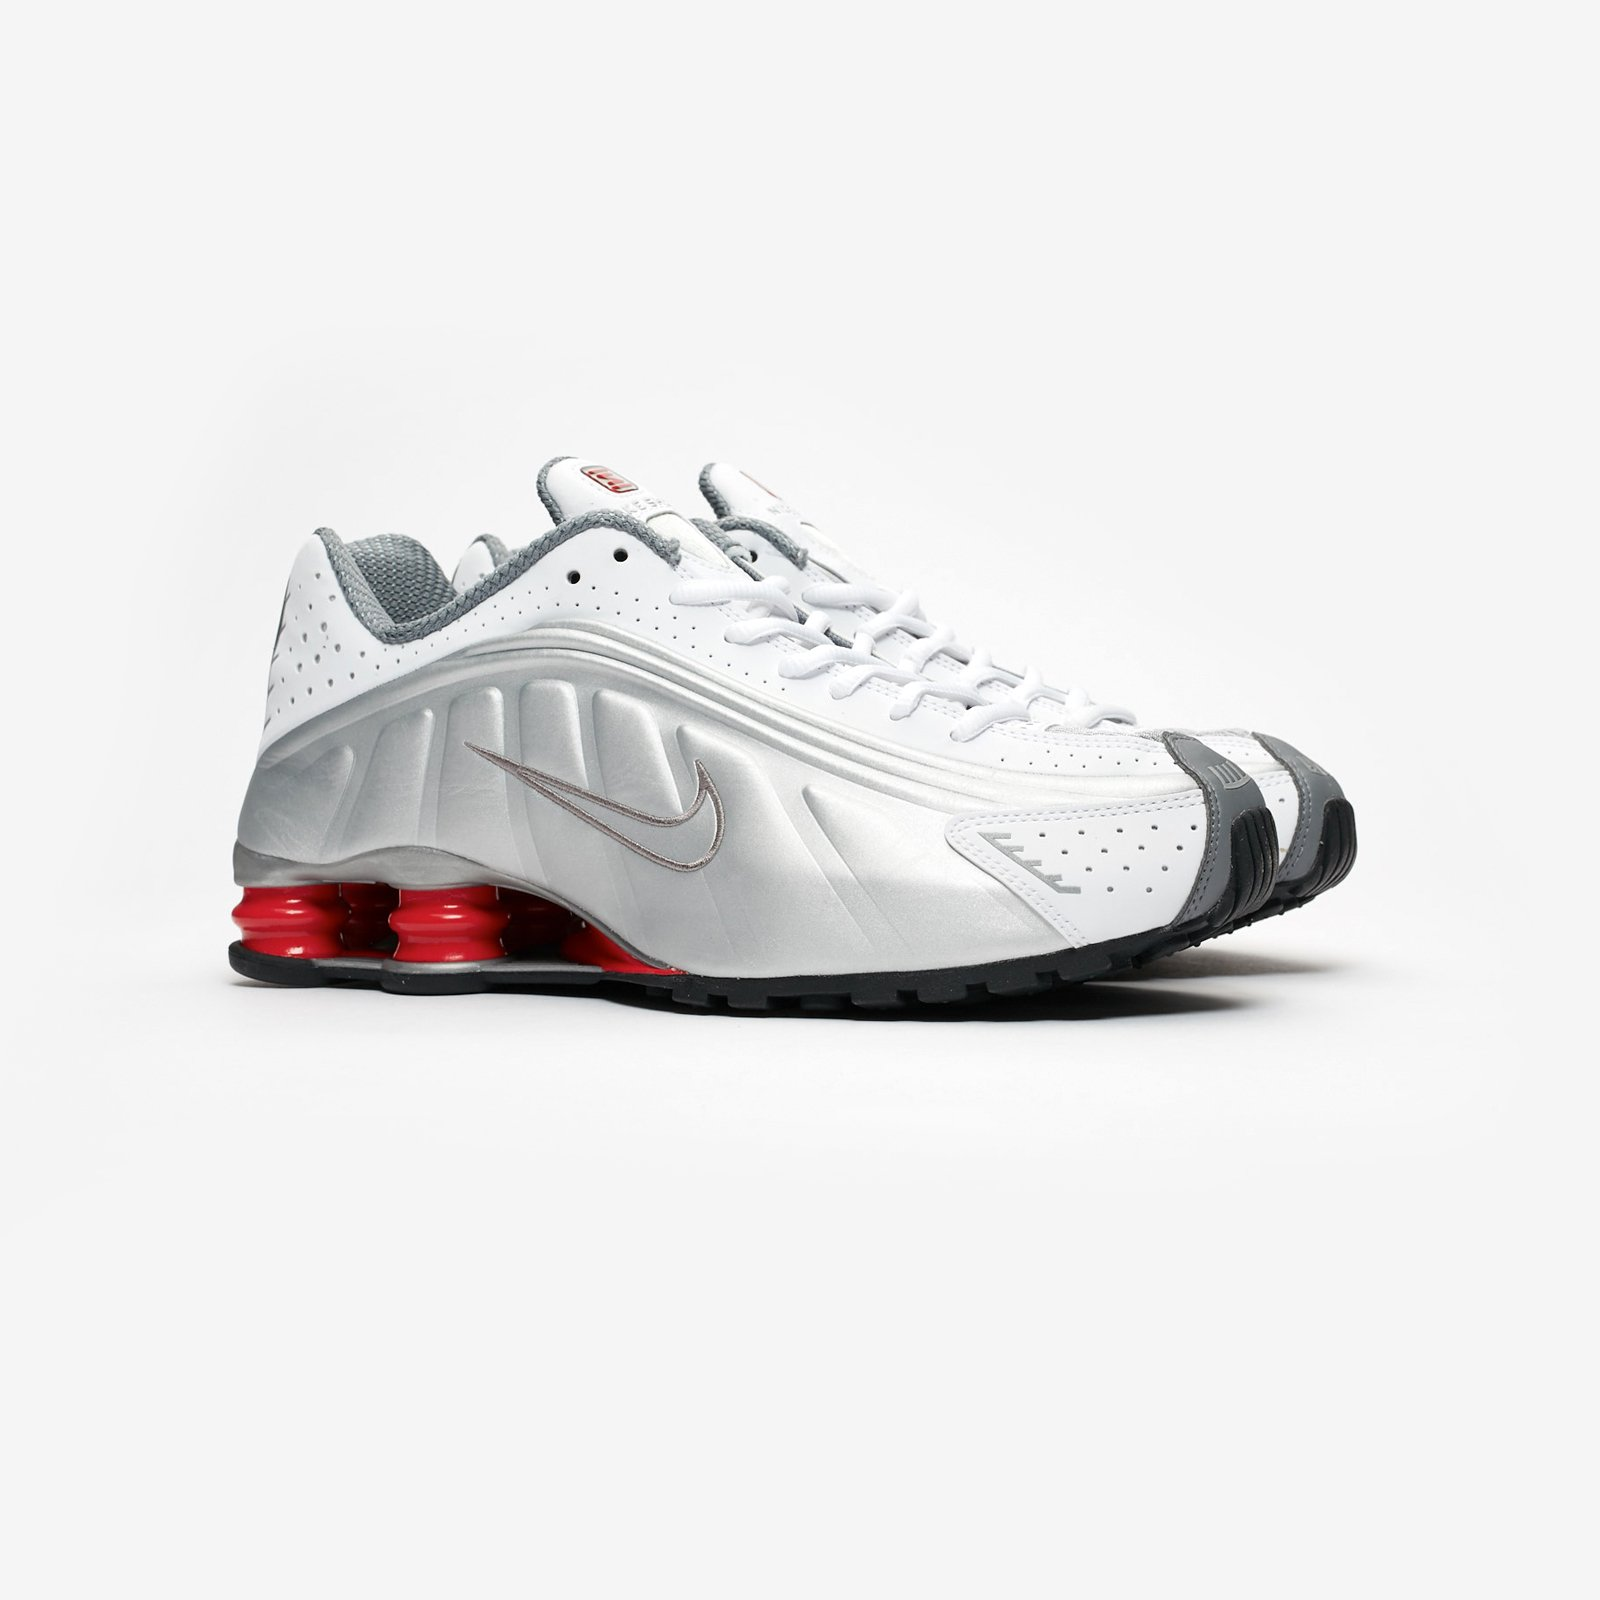 5c876e5c24f Nike Shox R4 - Bv1111-100 - Sneakersnstuff